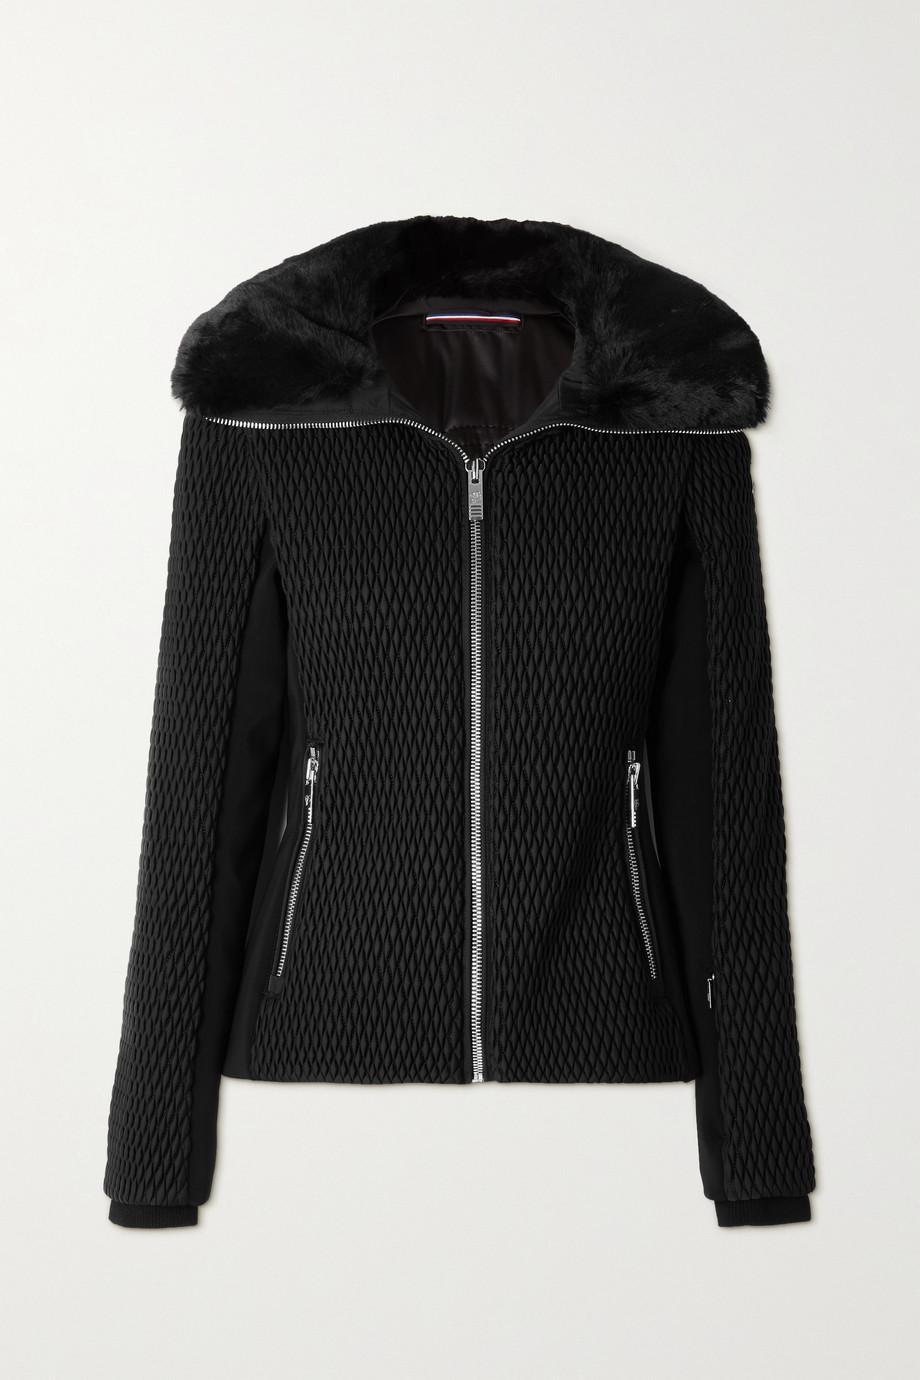 Fusalp Montana IV faux fur-trimmed quilted ski jacket